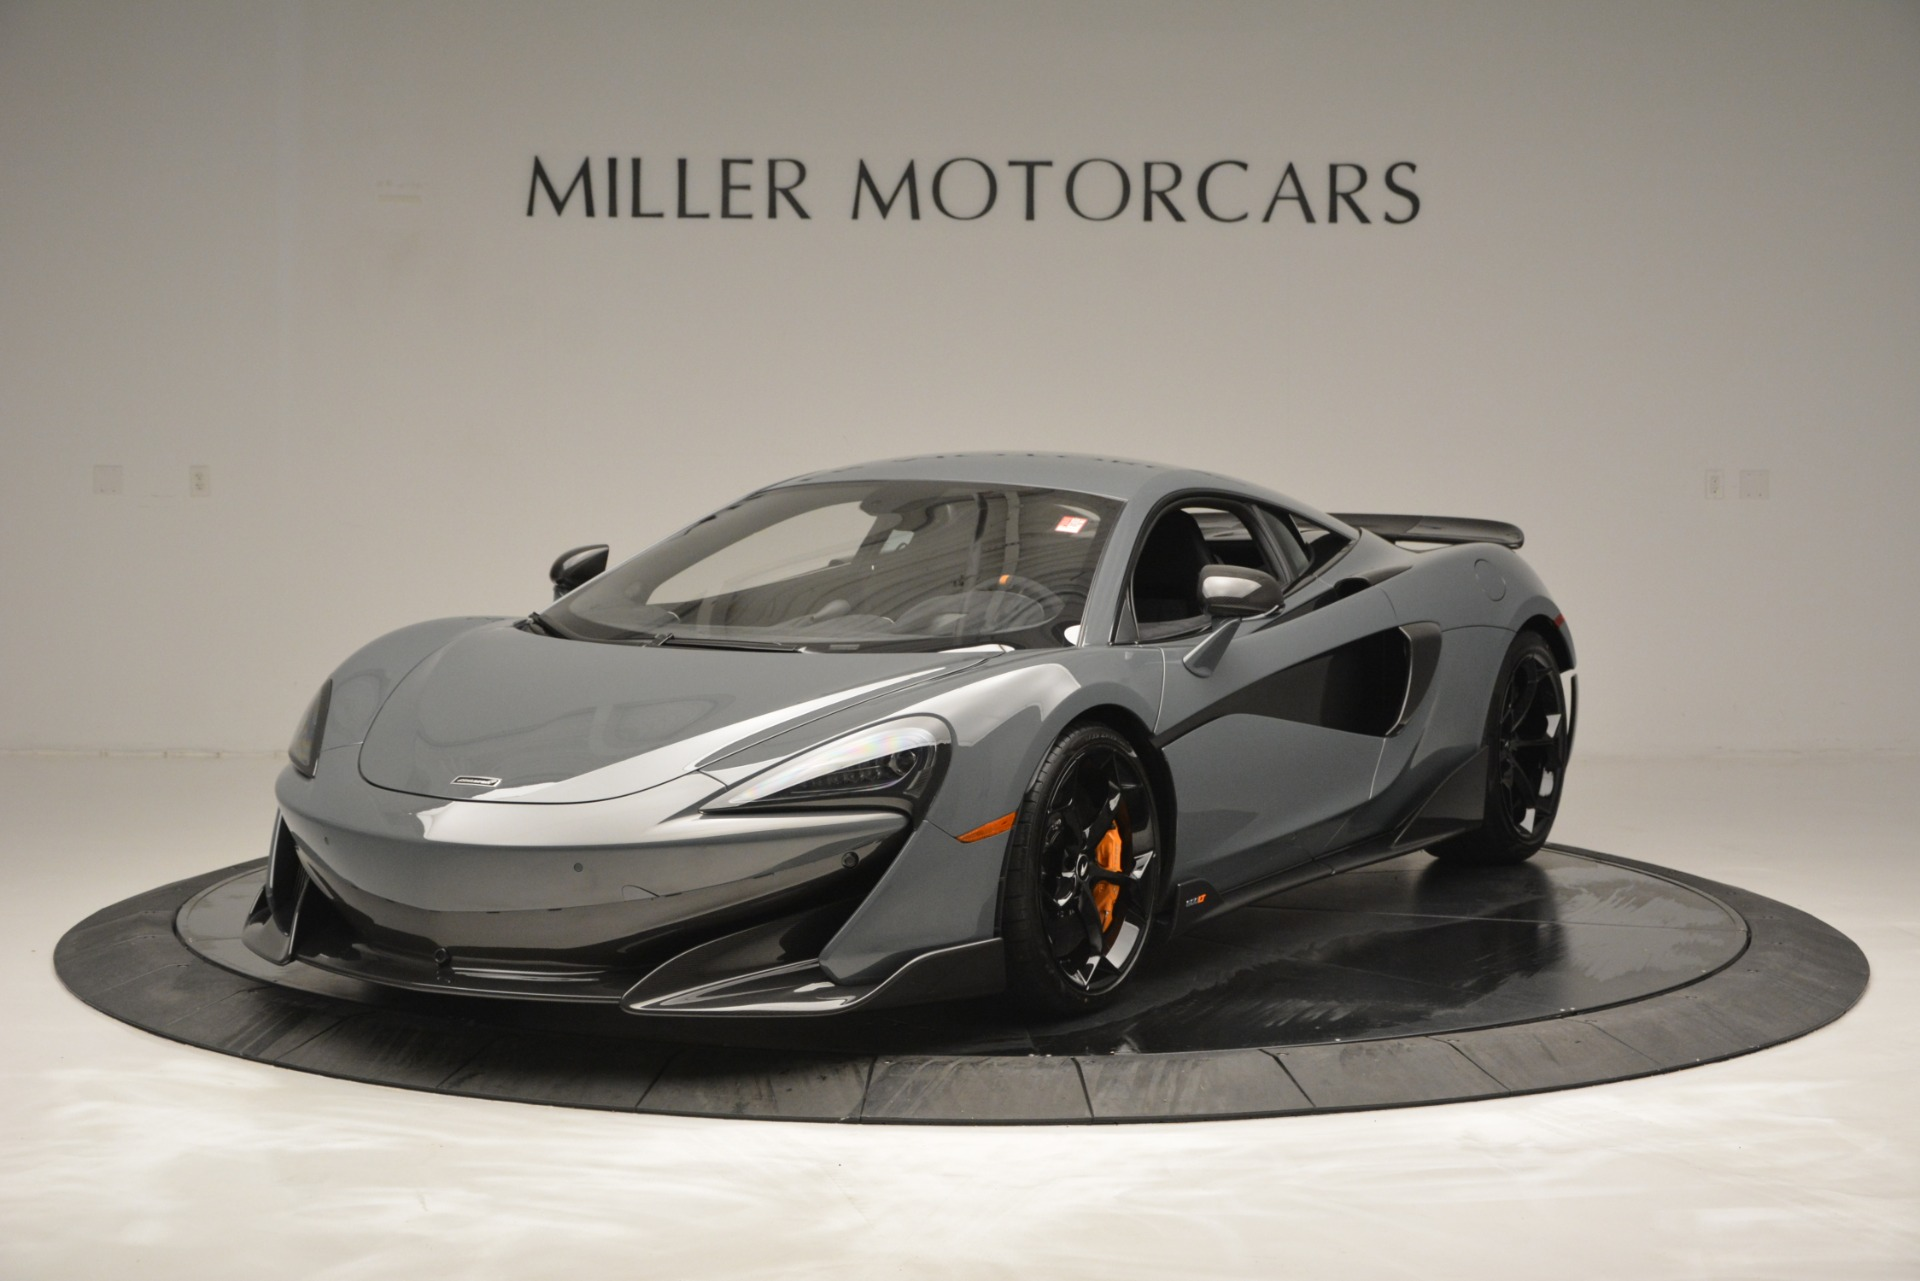 Used 2019 McLaren 600LT Luxury for sale Sold at Rolls-Royce Motor Cars Greenwich in Greenwich CT 06830 1